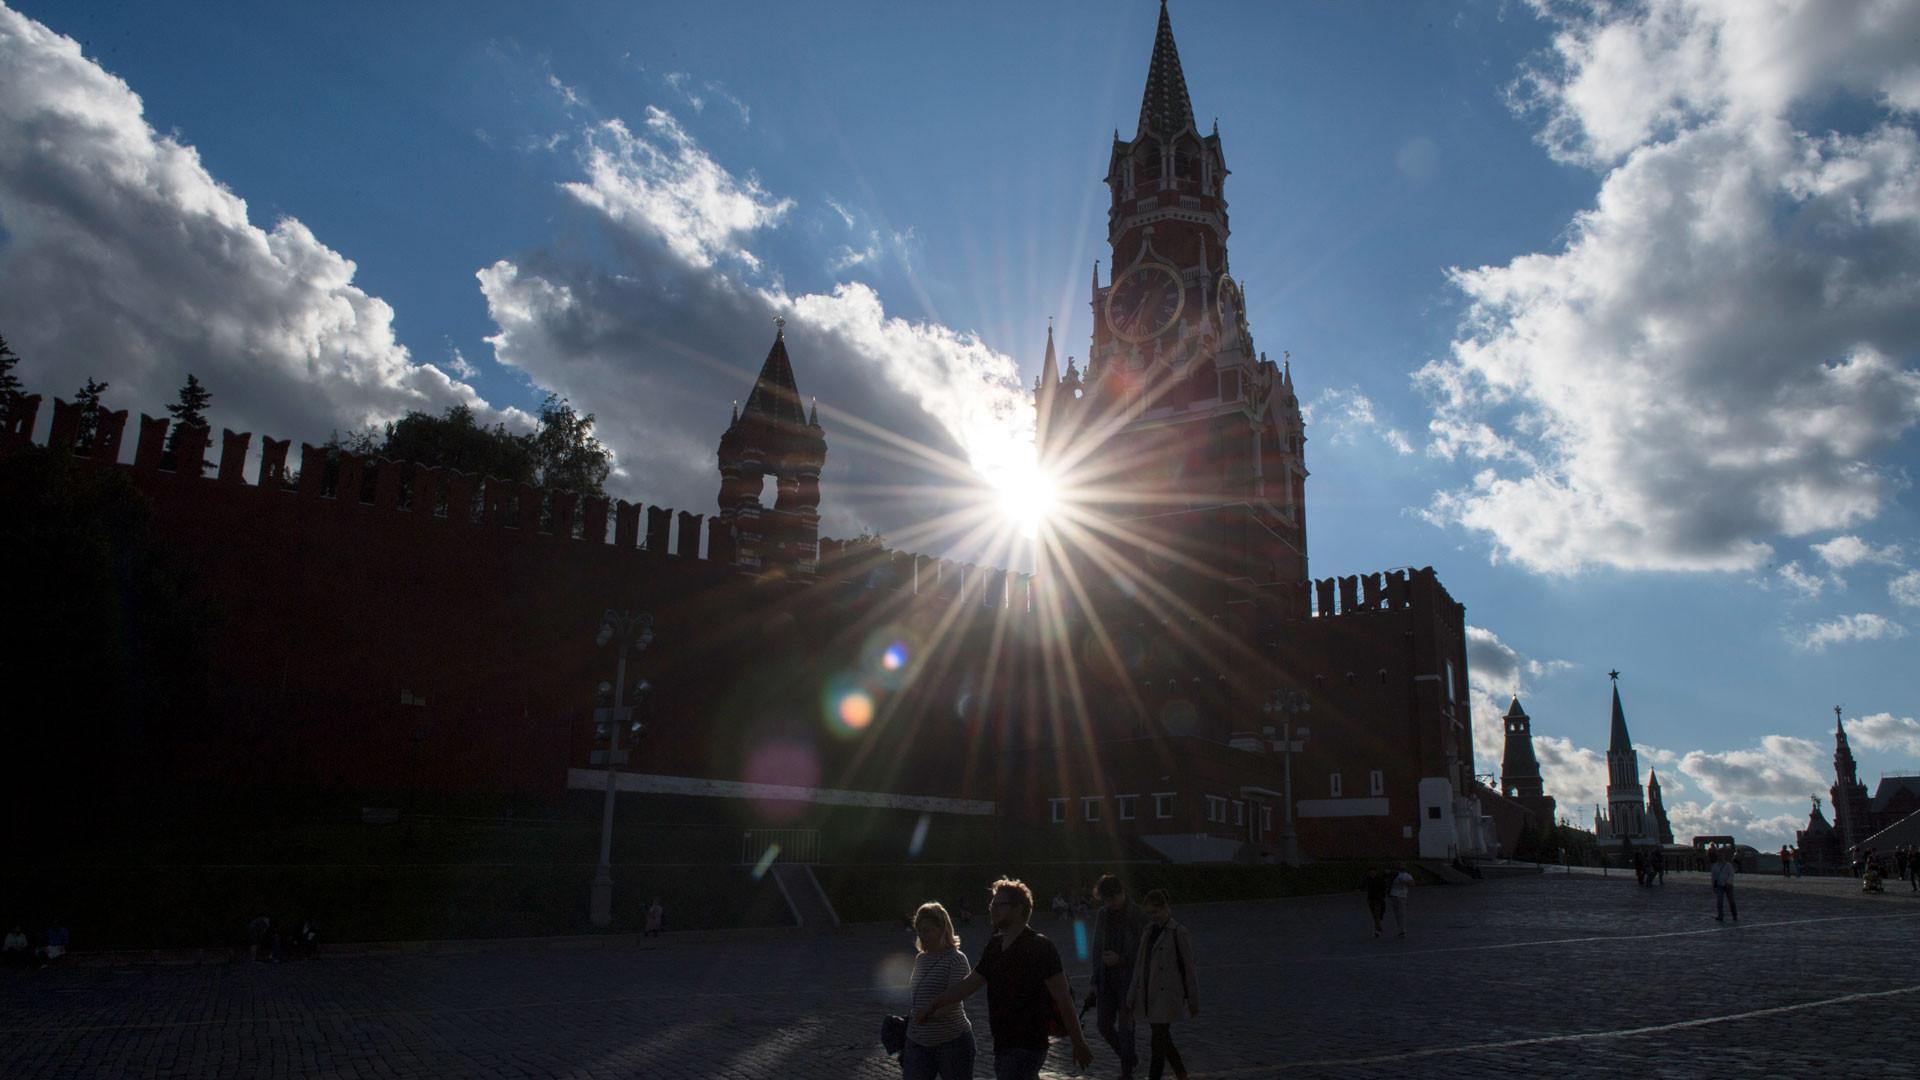 <p>Фото: &copy;&nbsp;РИА Новости/Максим Блинов</p>